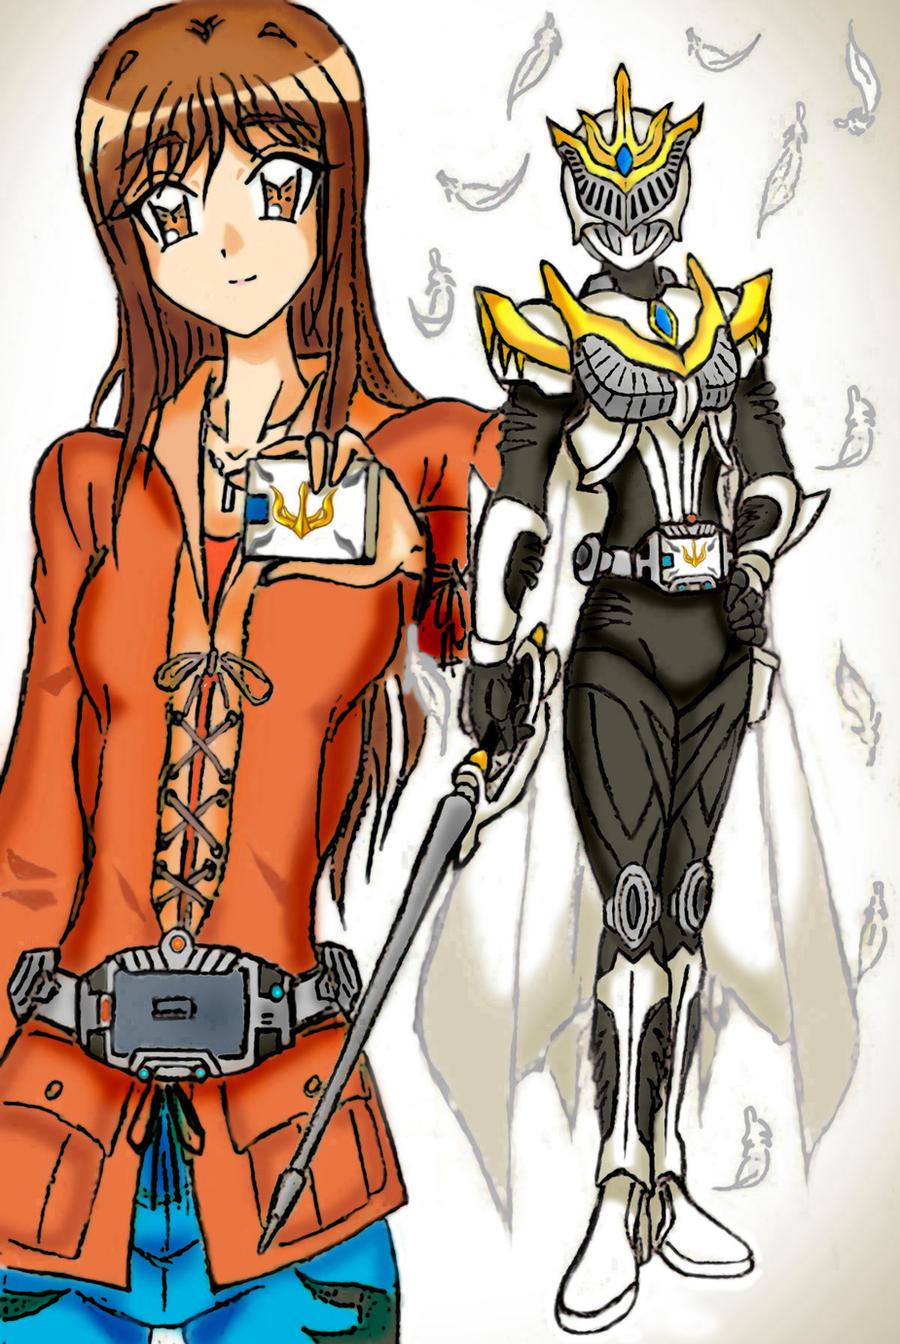 Kamen rider femme by grandzebulon on deviantart - Femme chat manga ...